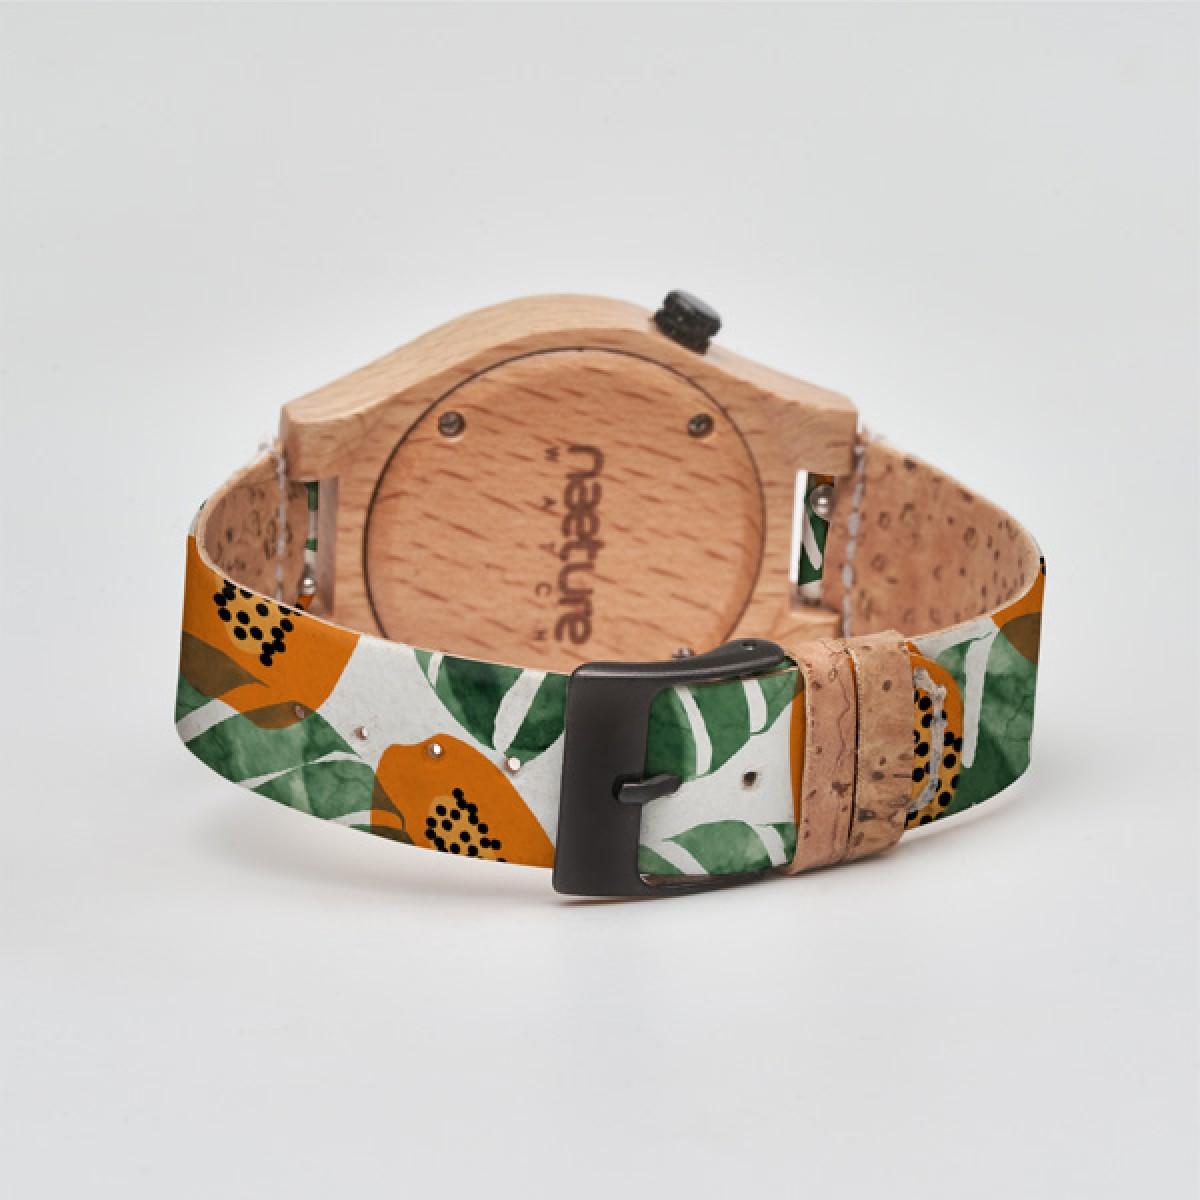 "Naeture Watch ""Papaya Jungle"" - Holzuhr mit veganem Armband"